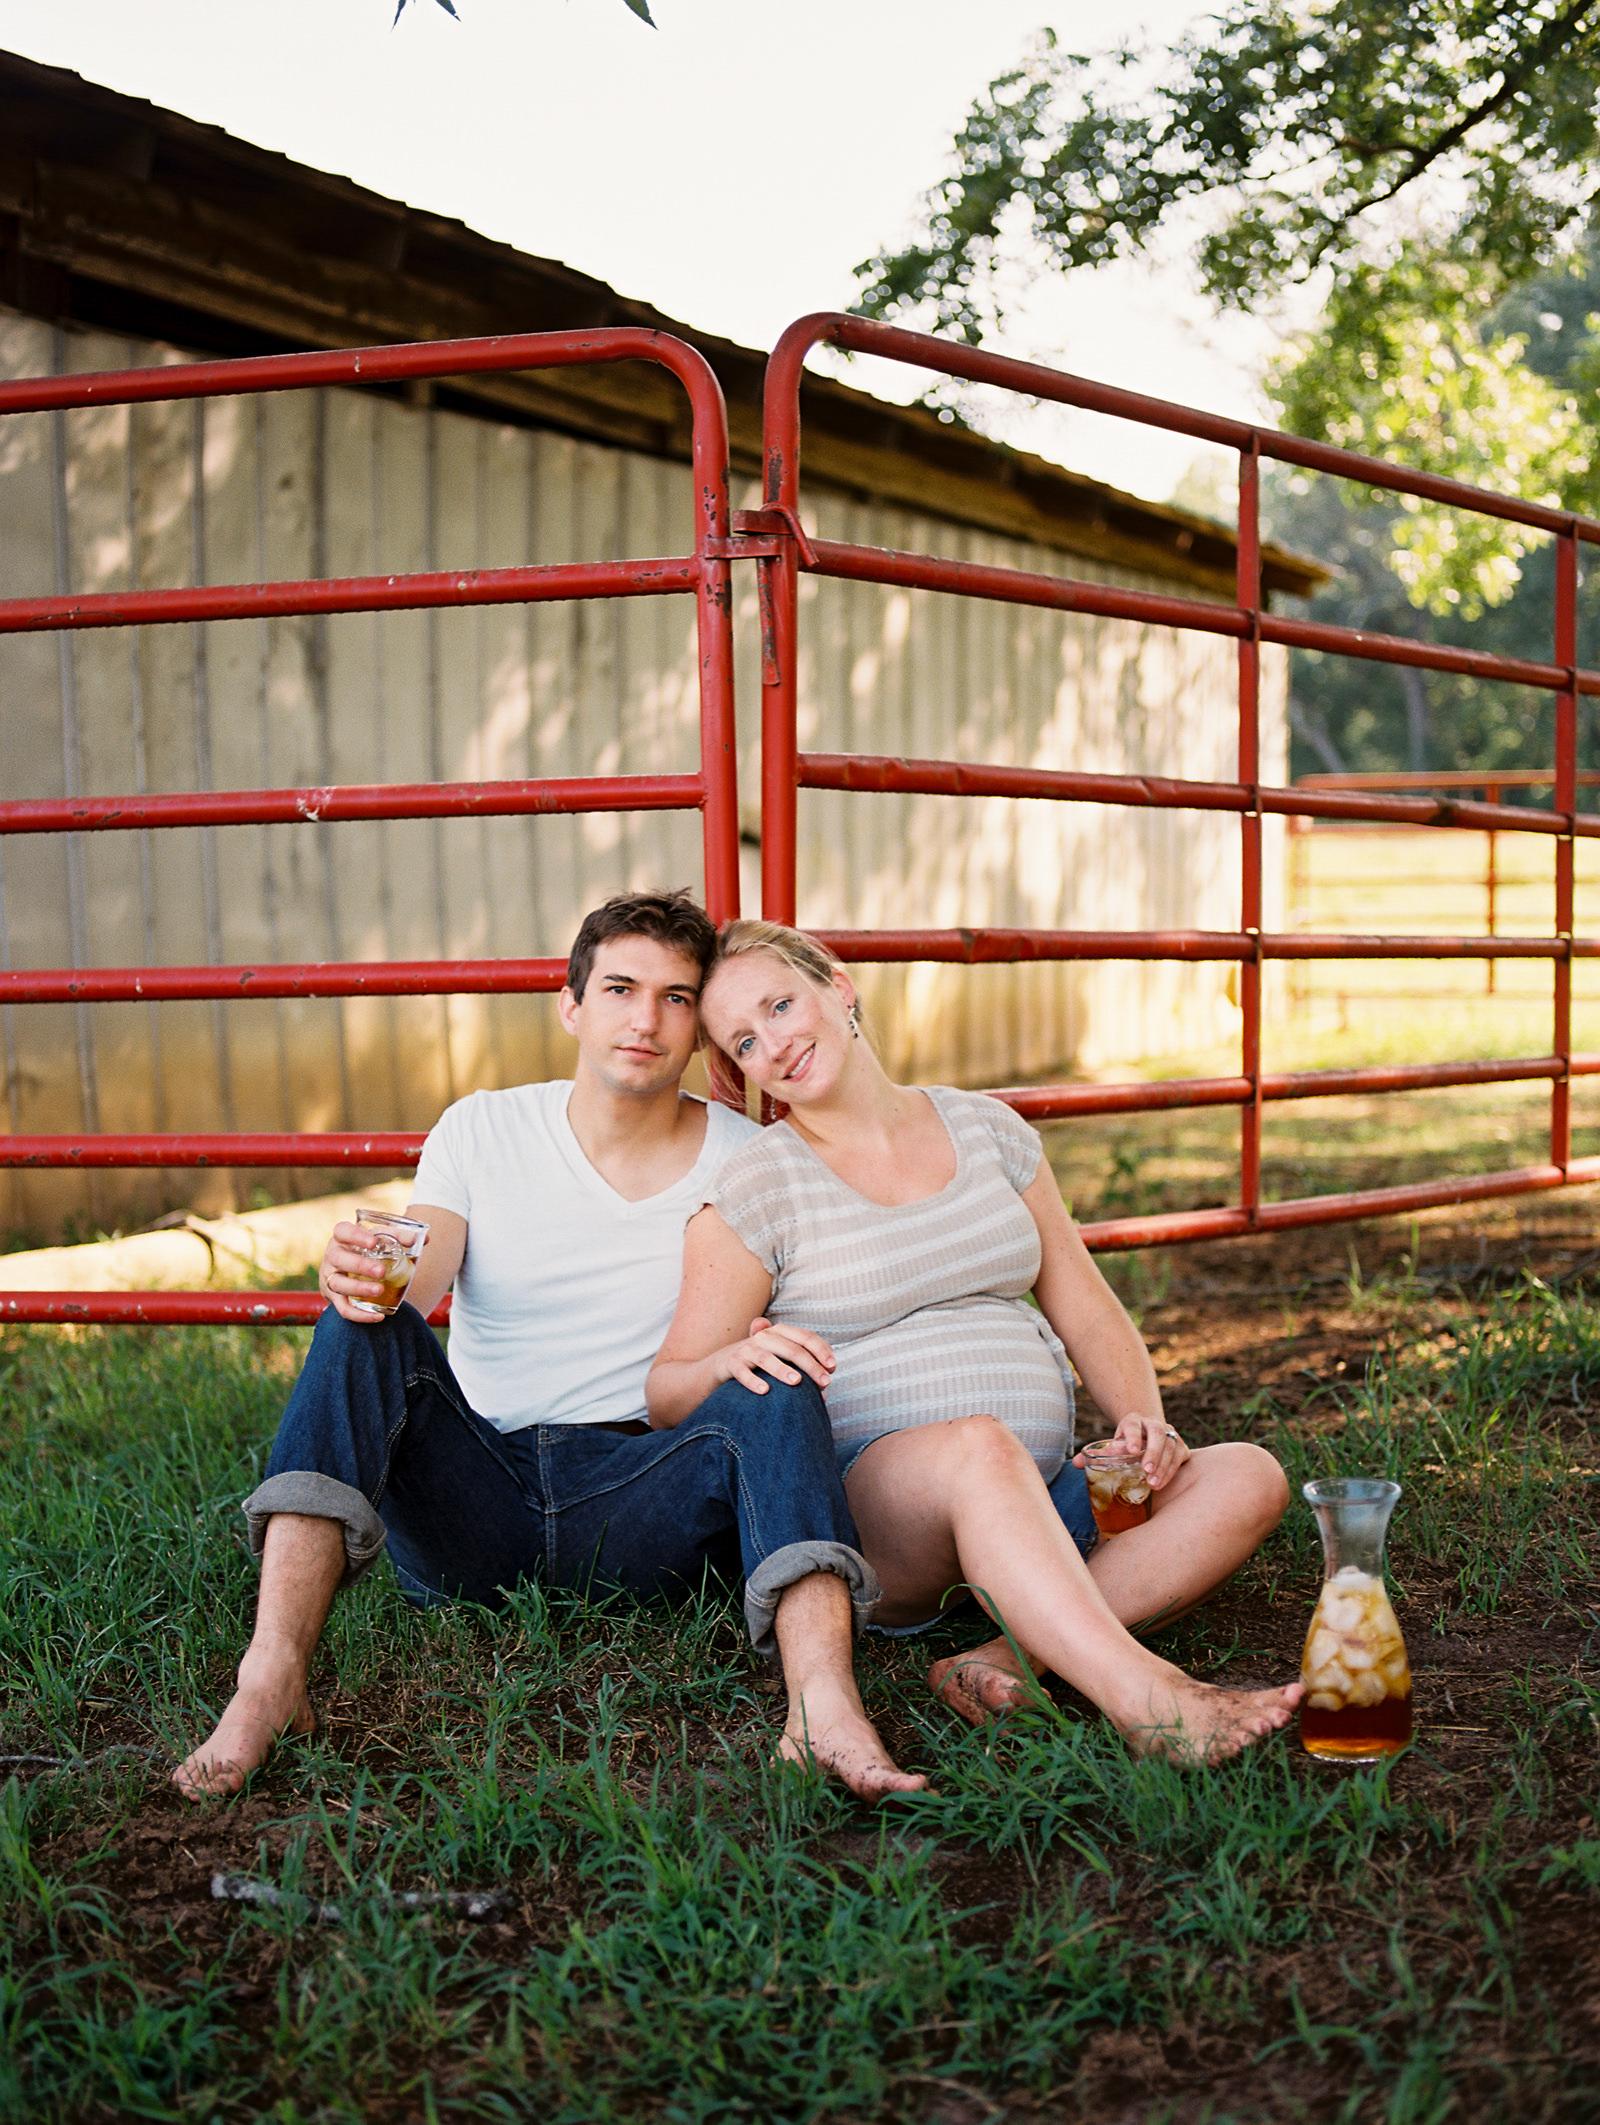 019-maternity-fine-art-film-lifestyle-photography.jpg